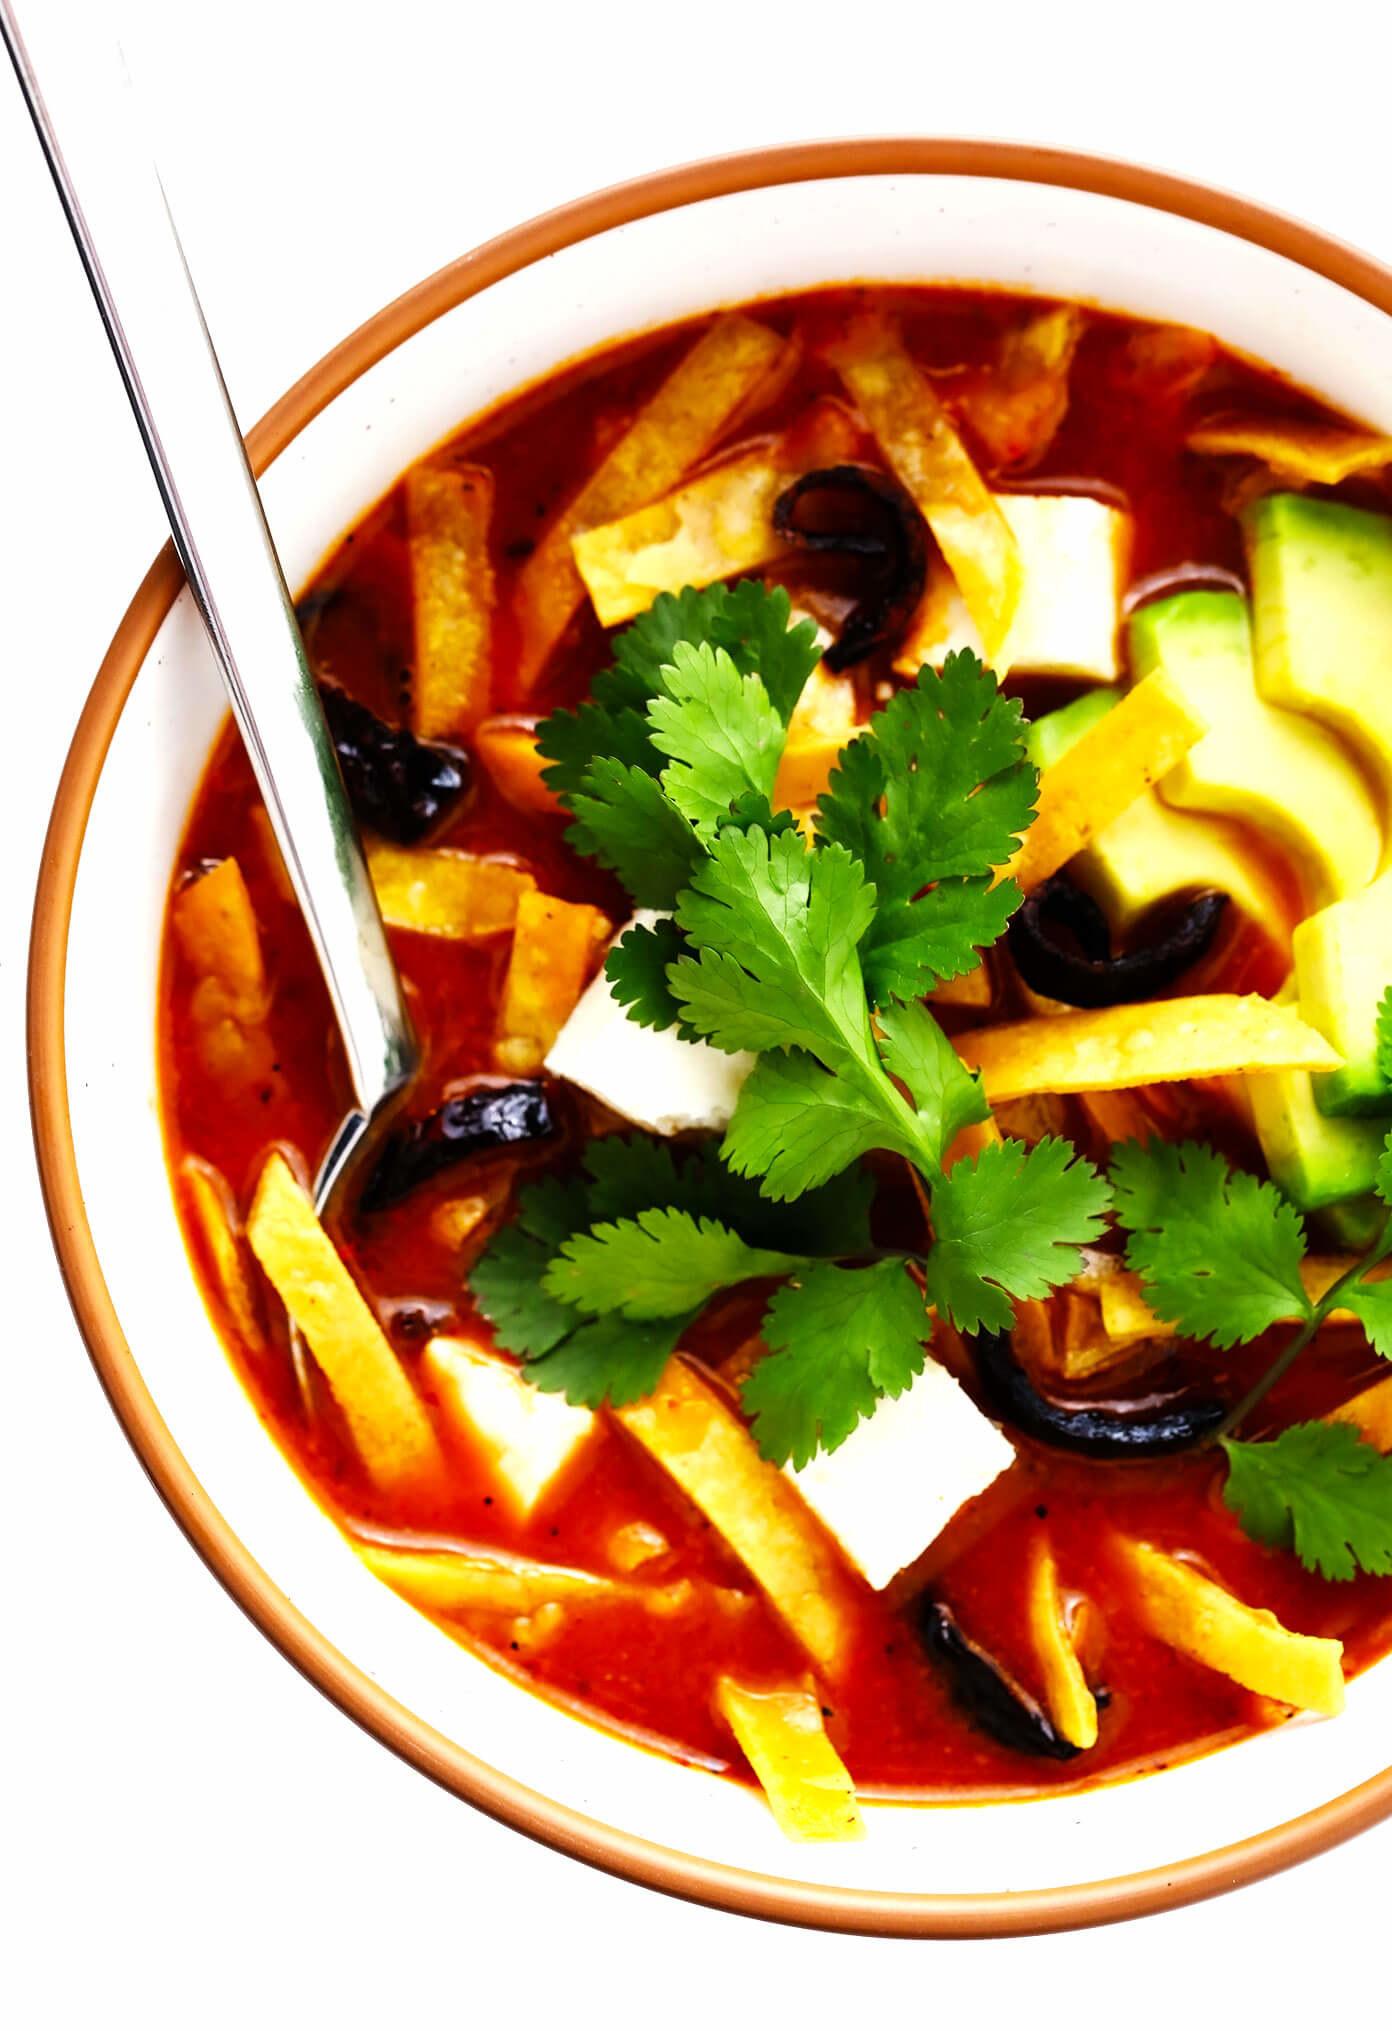 Sopa Azteca in a bowl